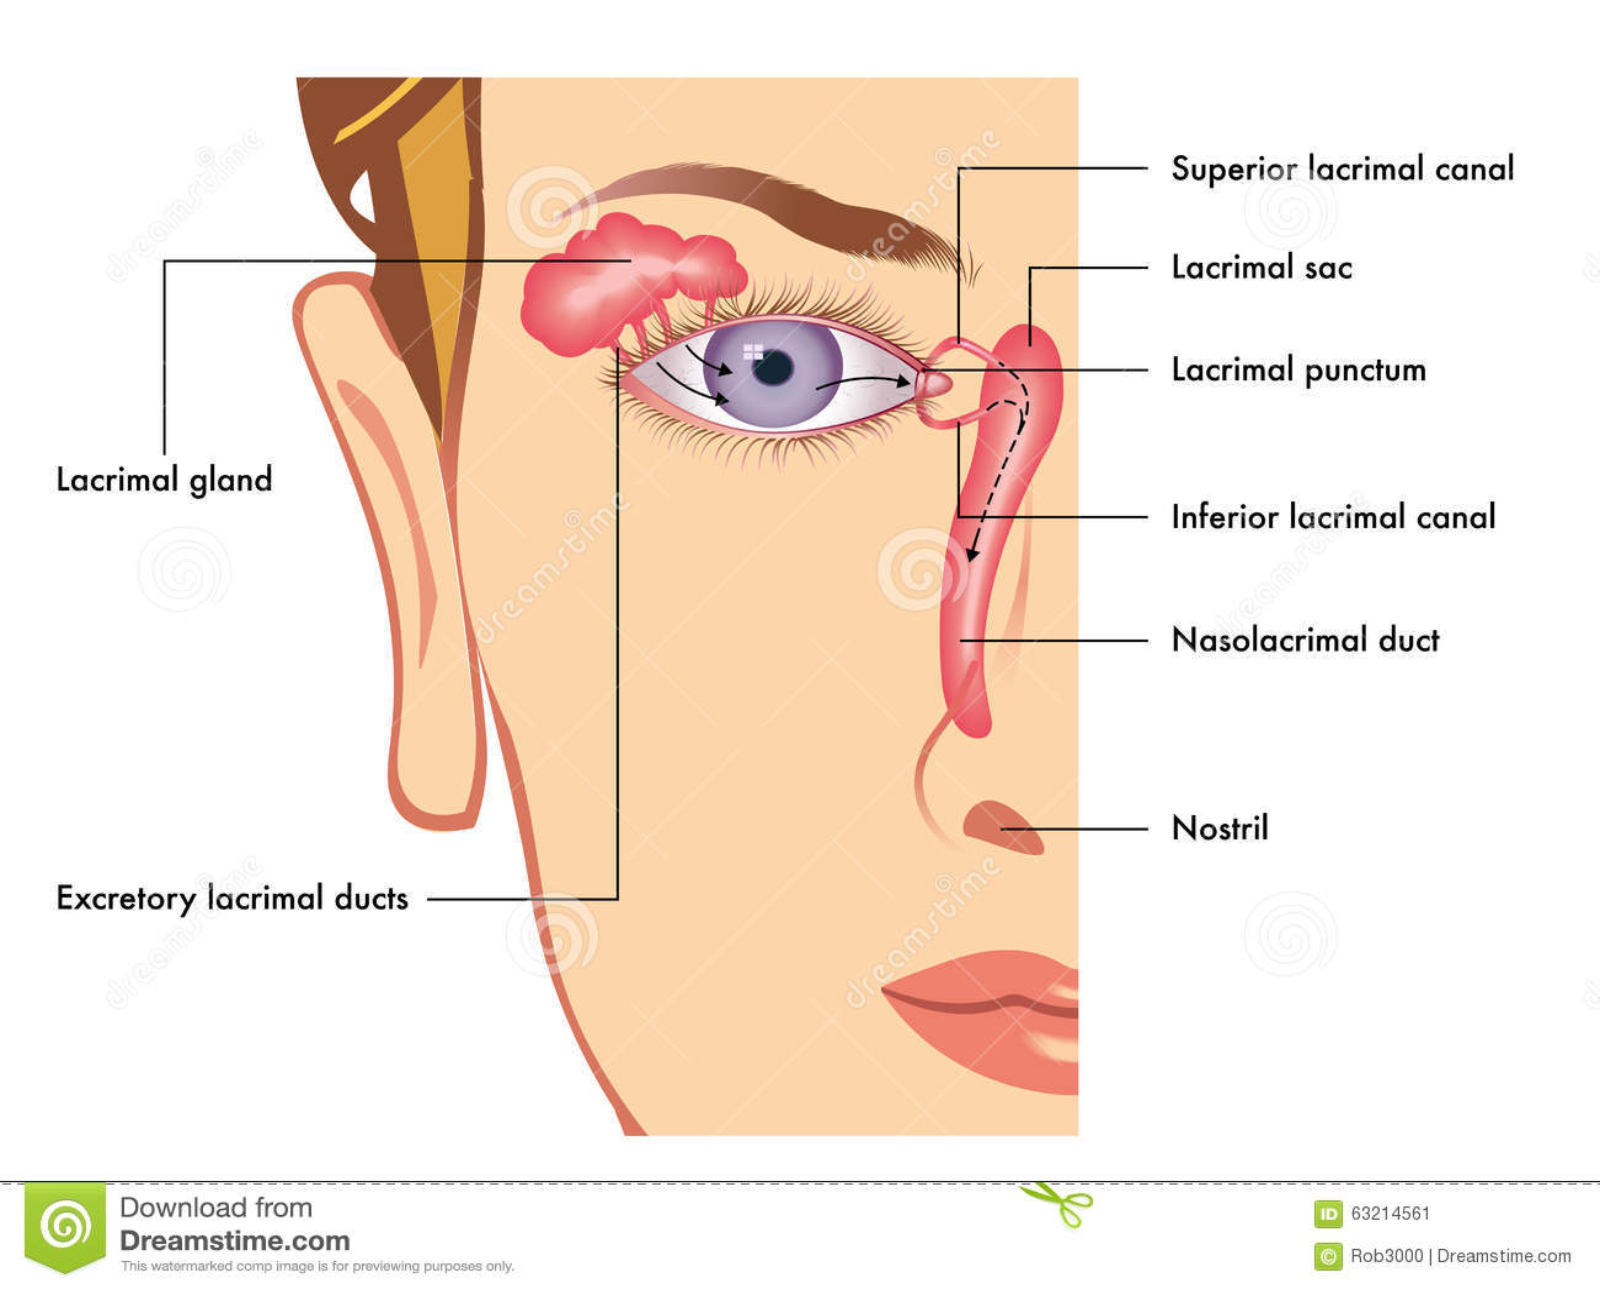 Lacrimal apparatus stock image. Image of apparatus, inferior - 63214561